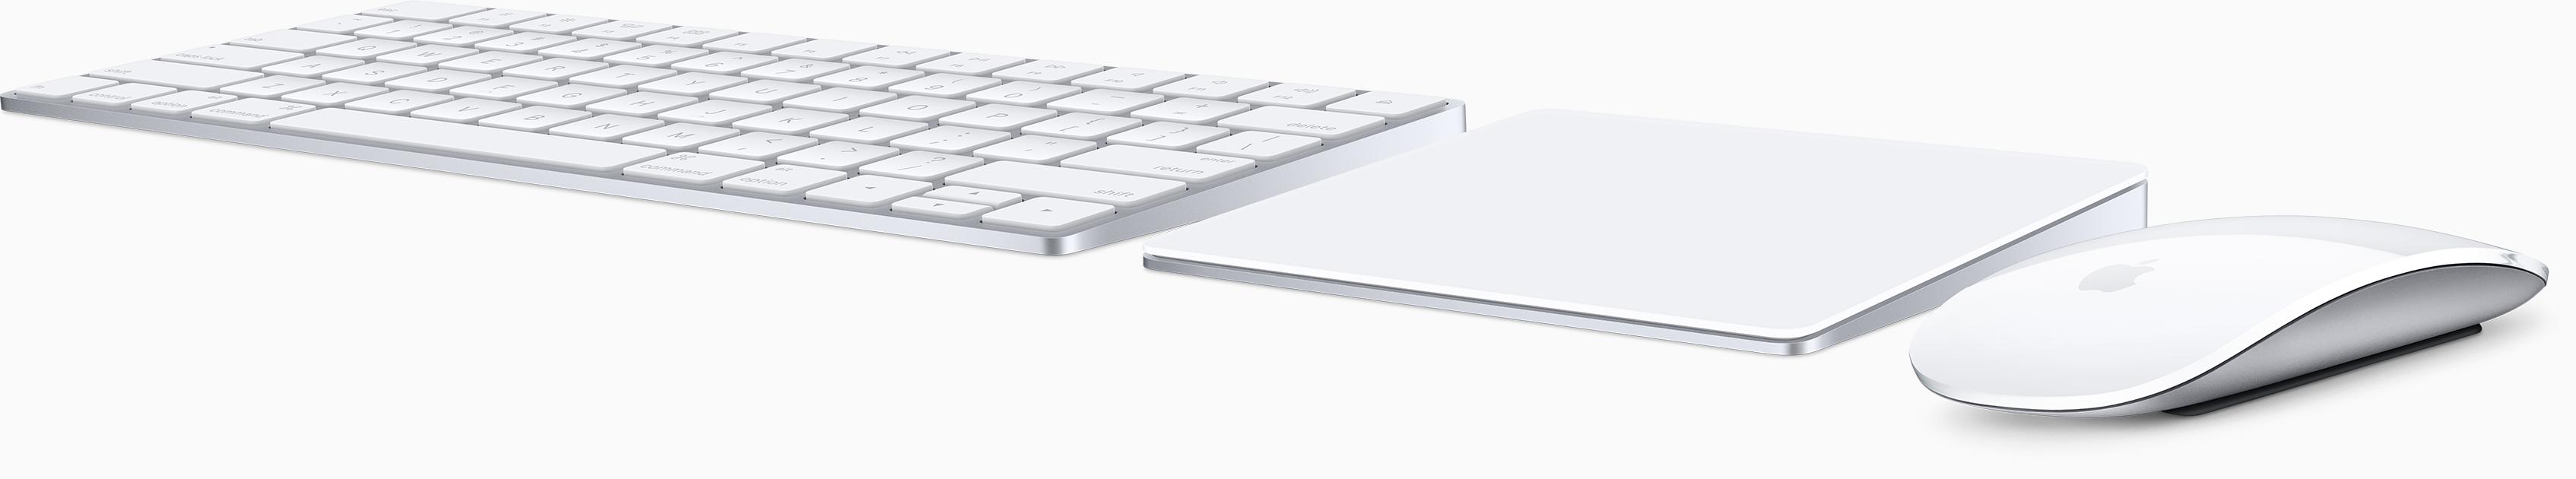 Magic Keyboard, Magic Mouse2, Magic Truckpad2を触ってきたよ